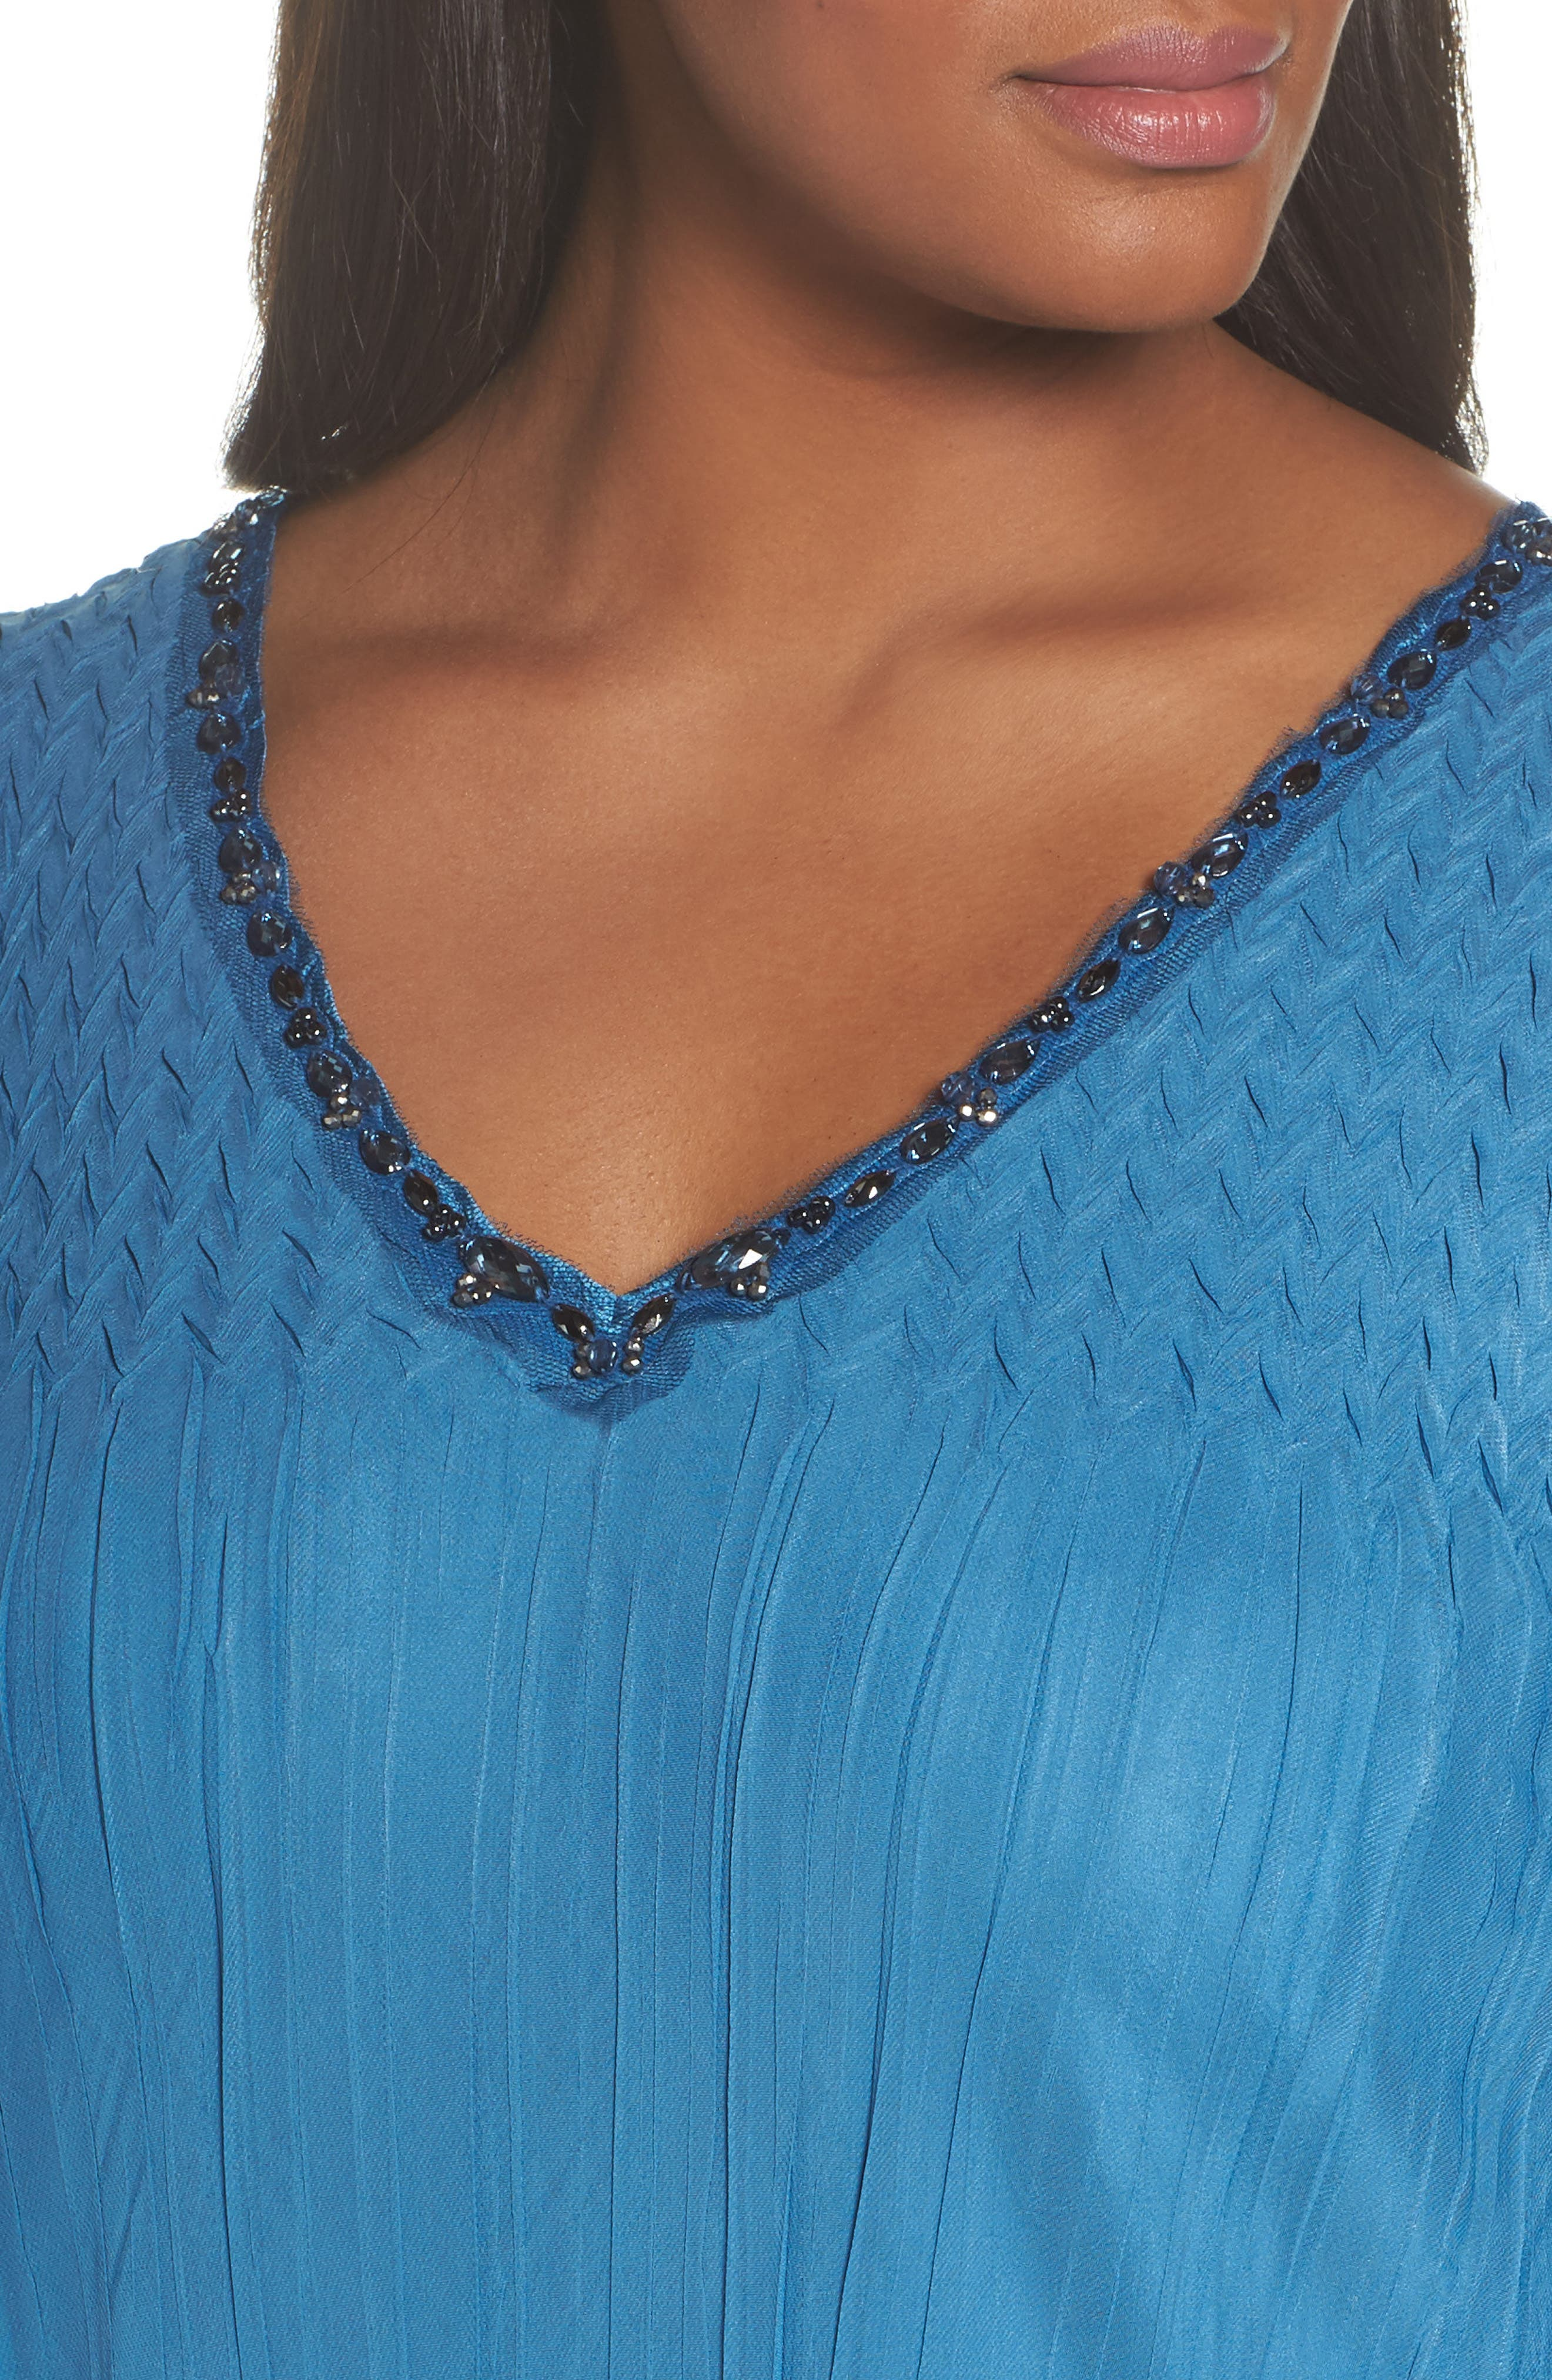 Dress Tiered Chiffon & Charmeuse Dress,                             Alternate thumbnail 4, color,                             Blue Dusk Night Ombre